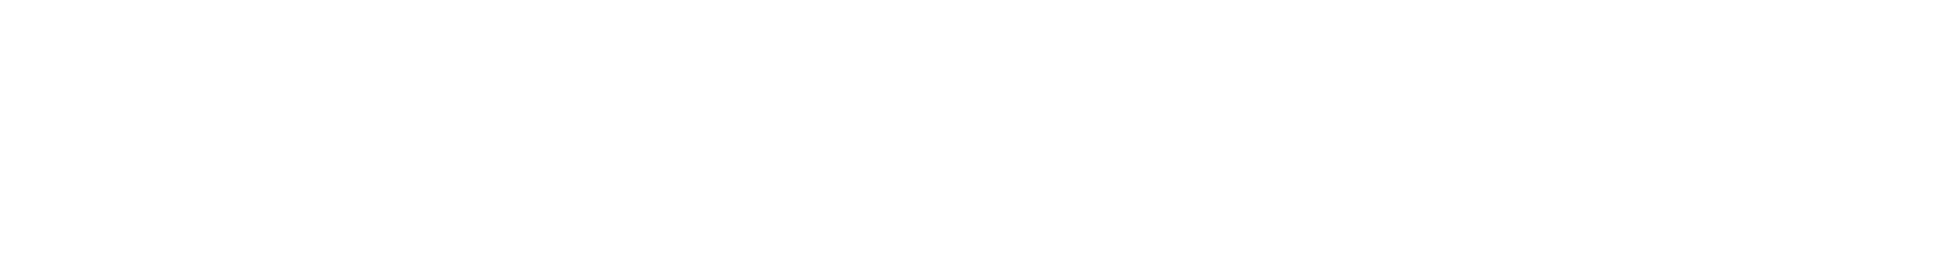 genesis-wave-white-1